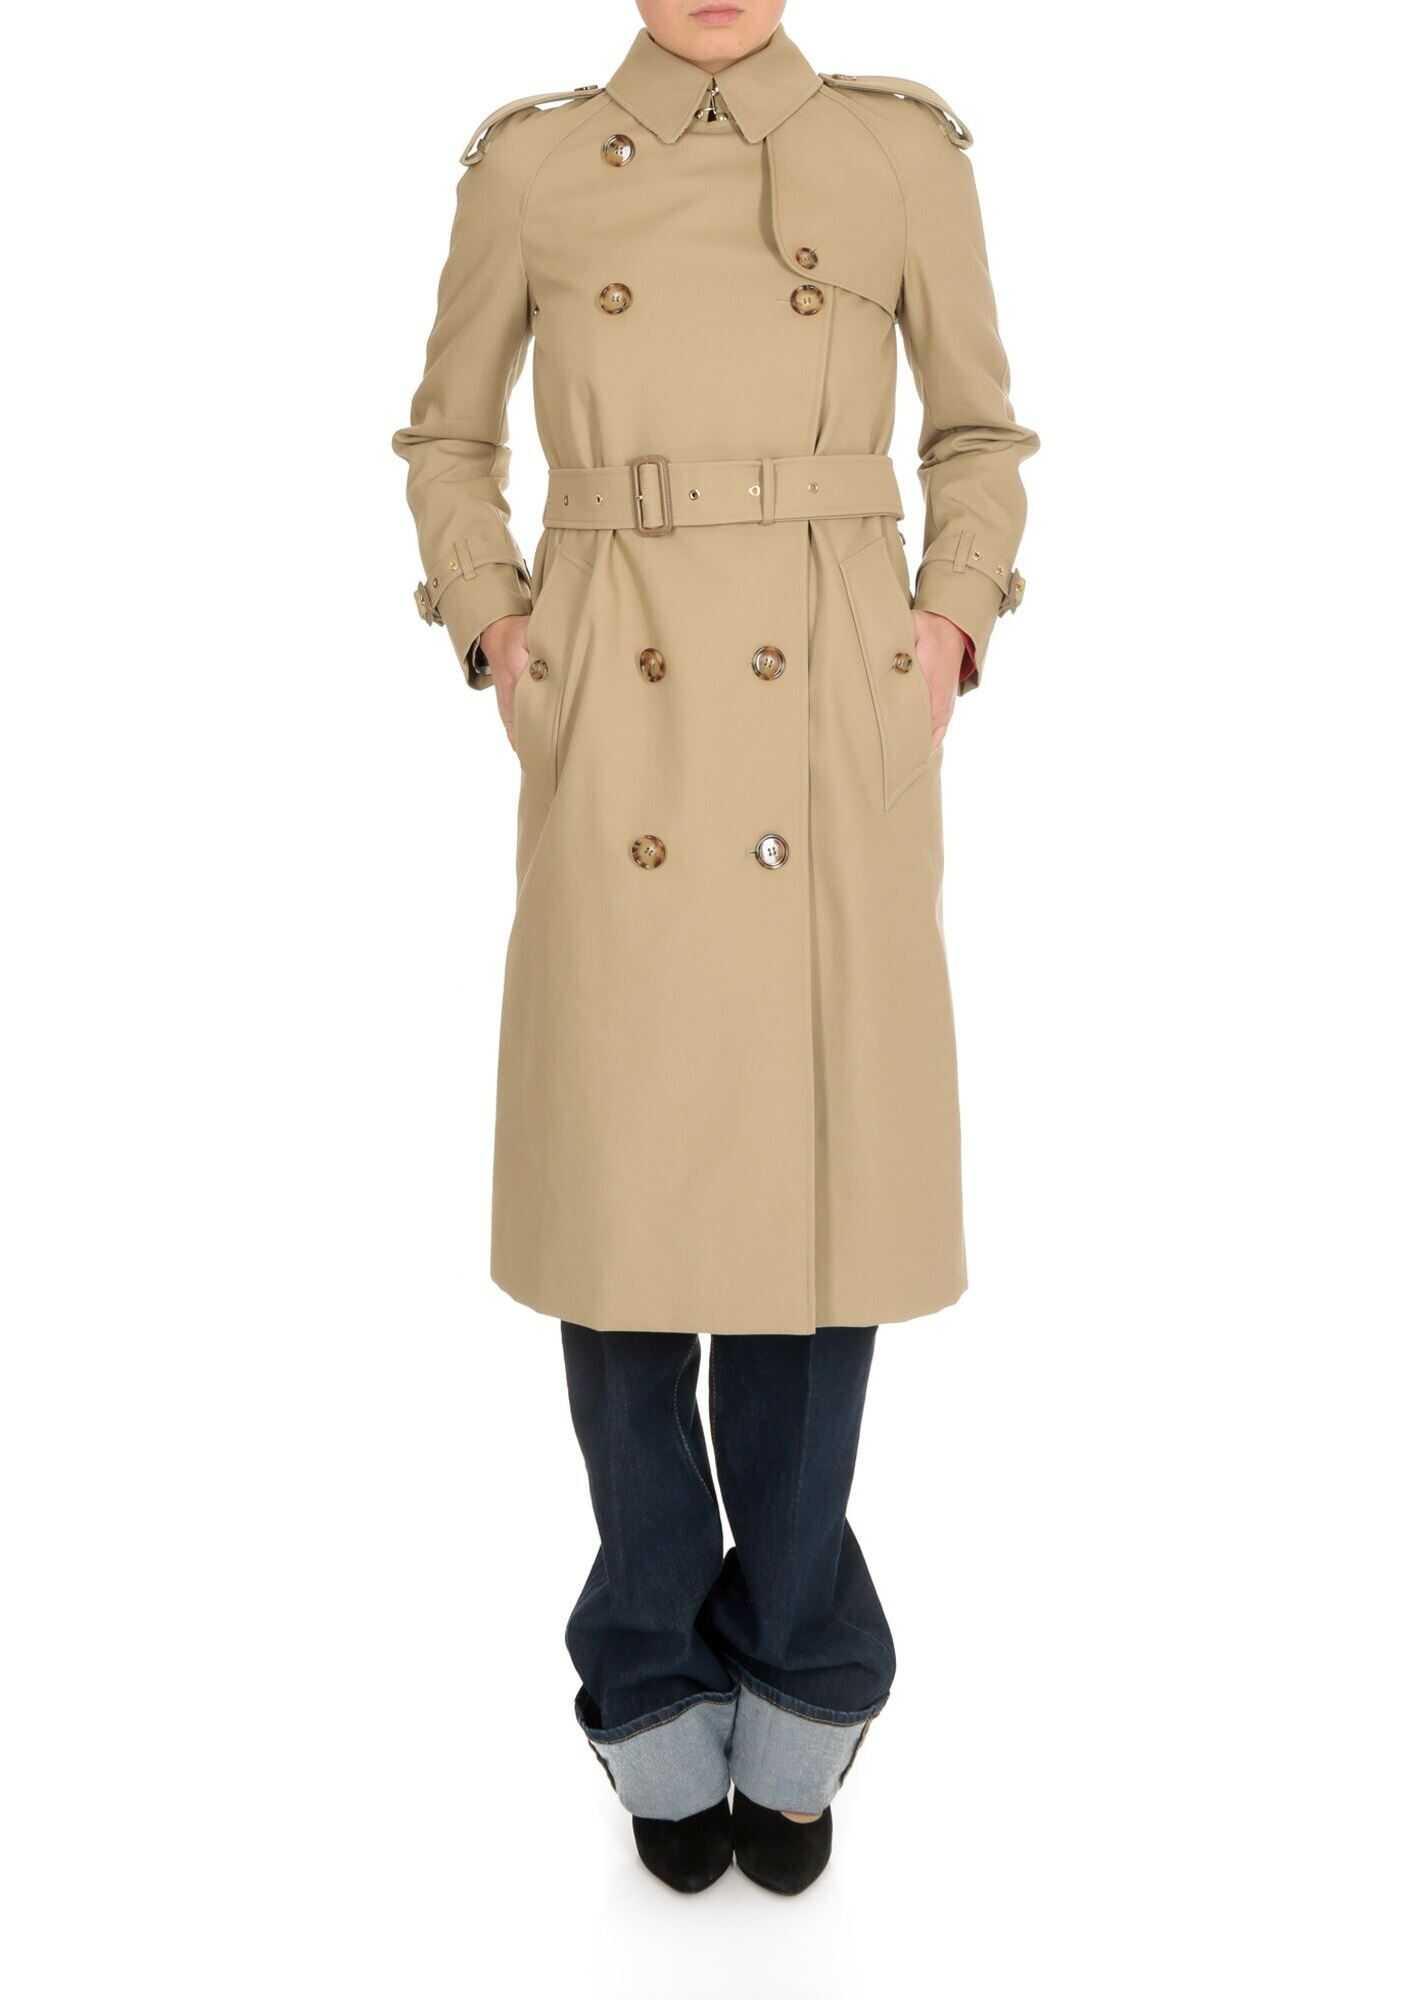 Bridstown Trench Coat In Honey Beige thumbnail